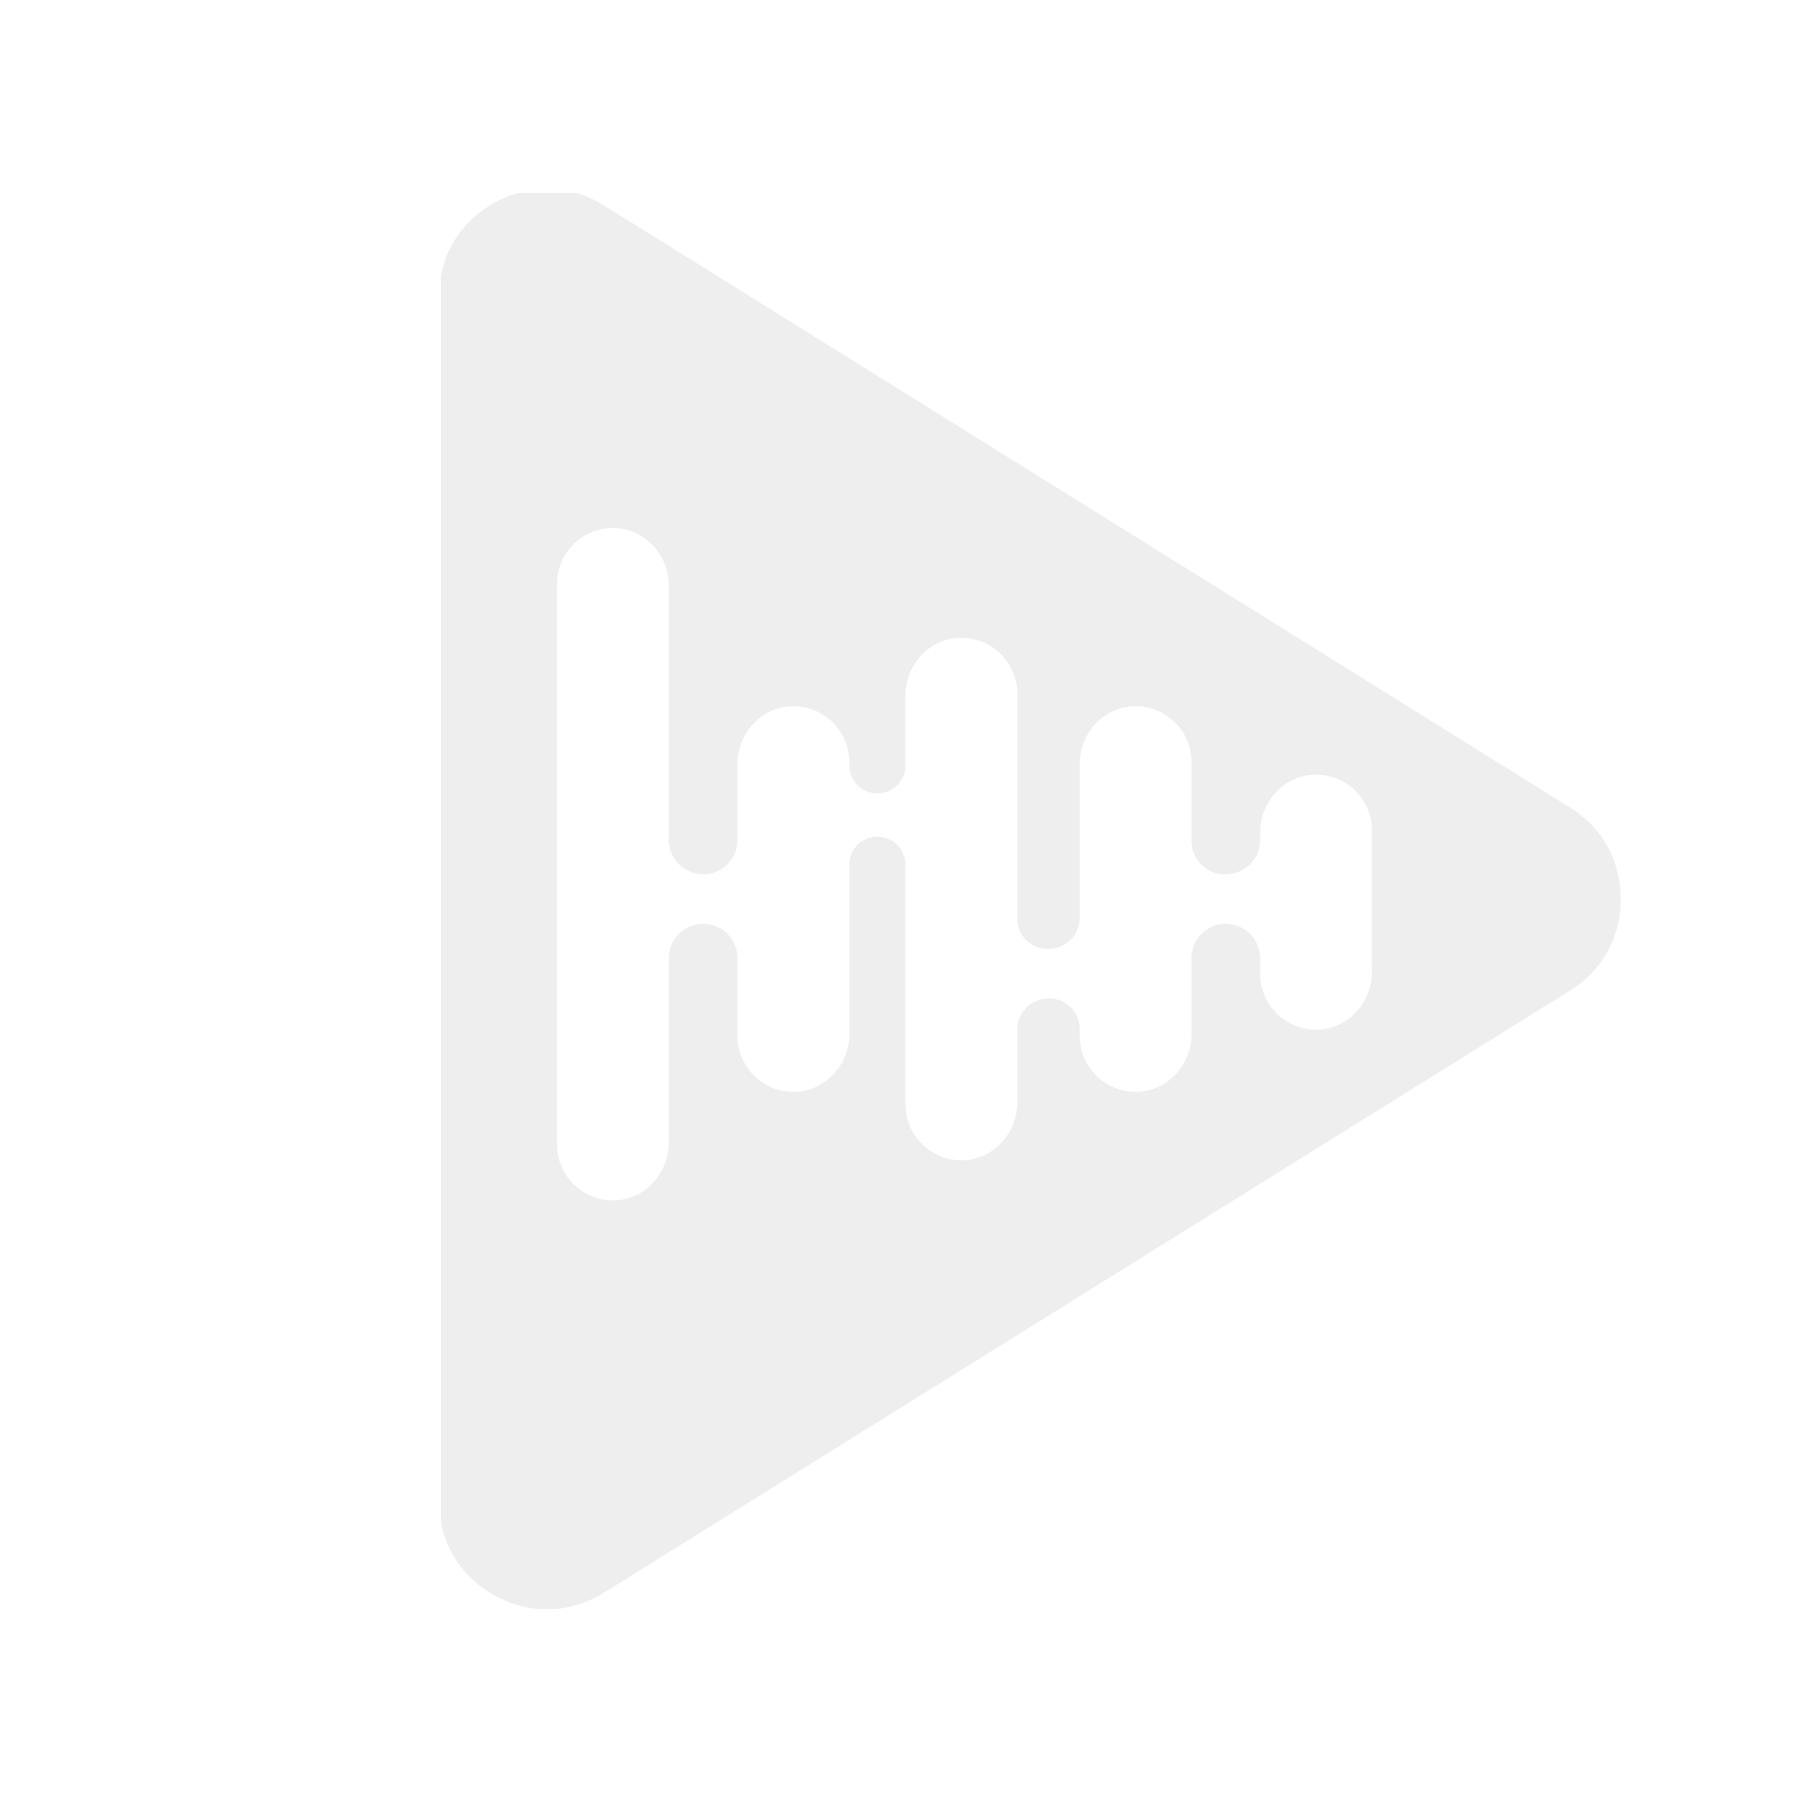 Speedsignal B-3414772